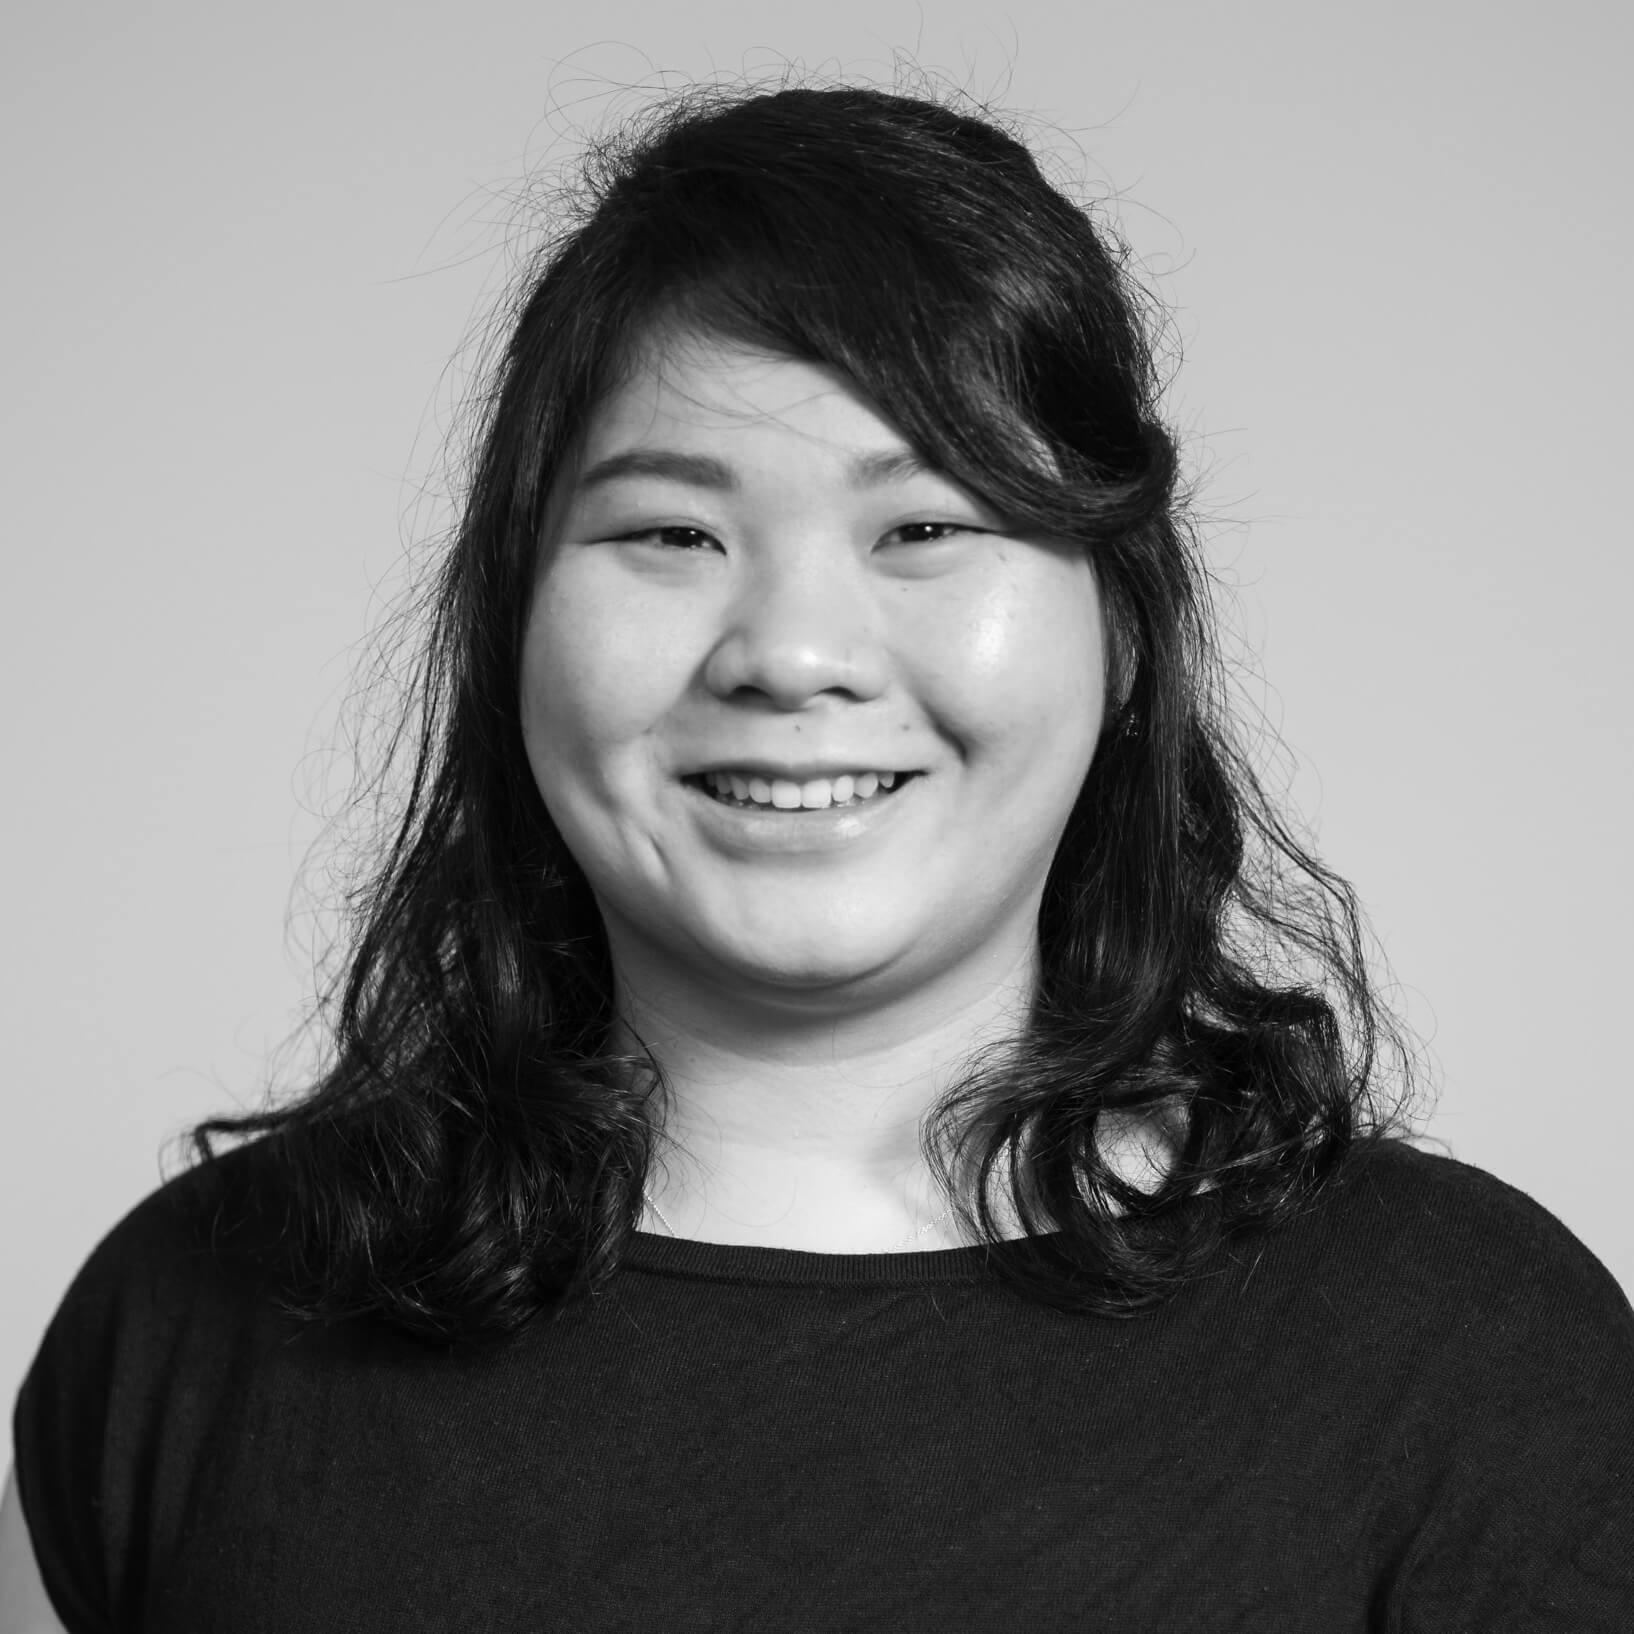 Chloe-Chai--B&W---Website-profile-.jpg